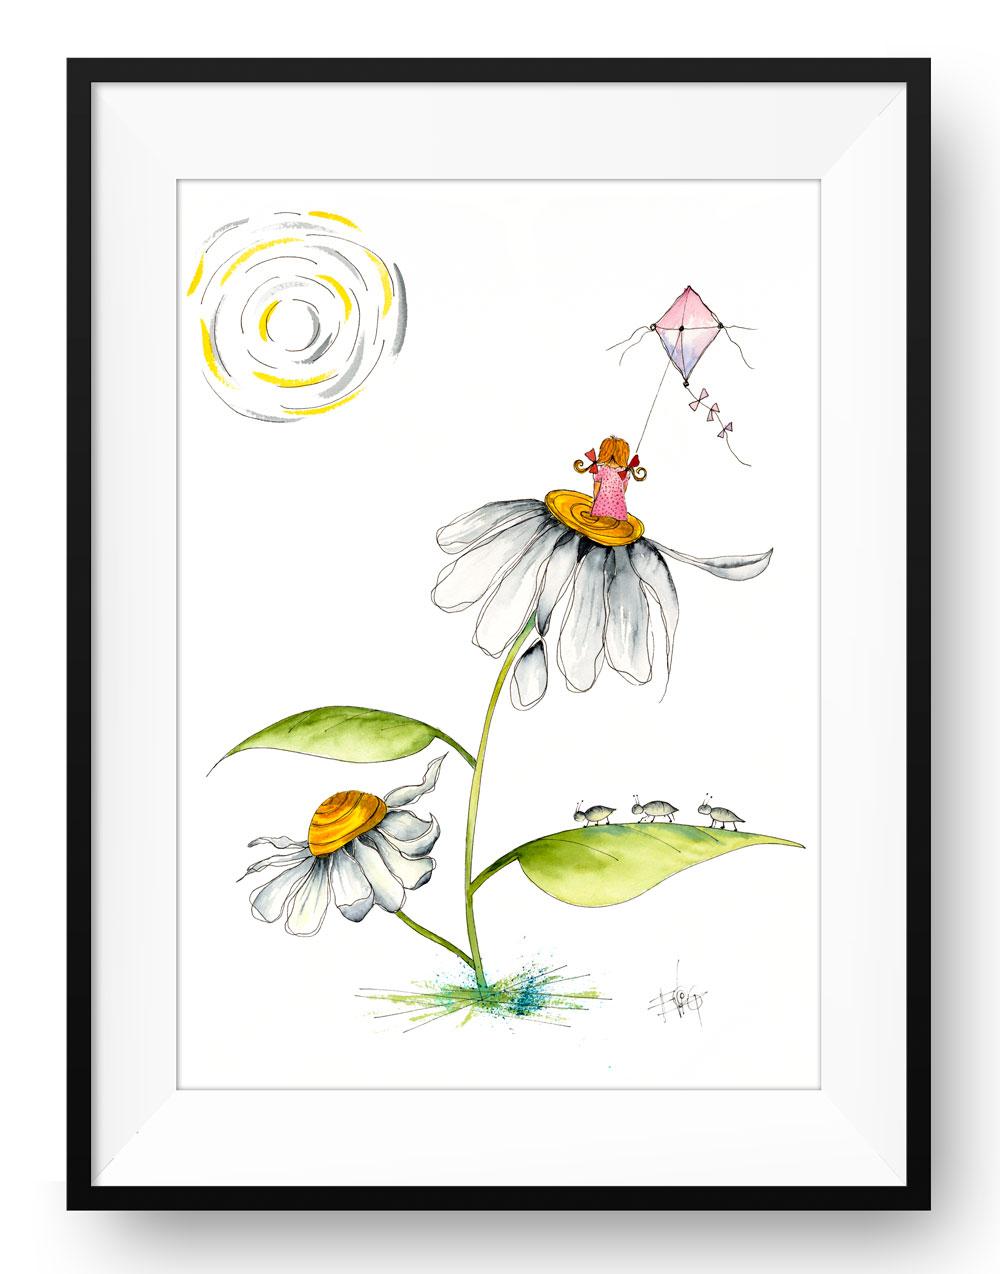 Blomster barn med dragen | Eva Vig